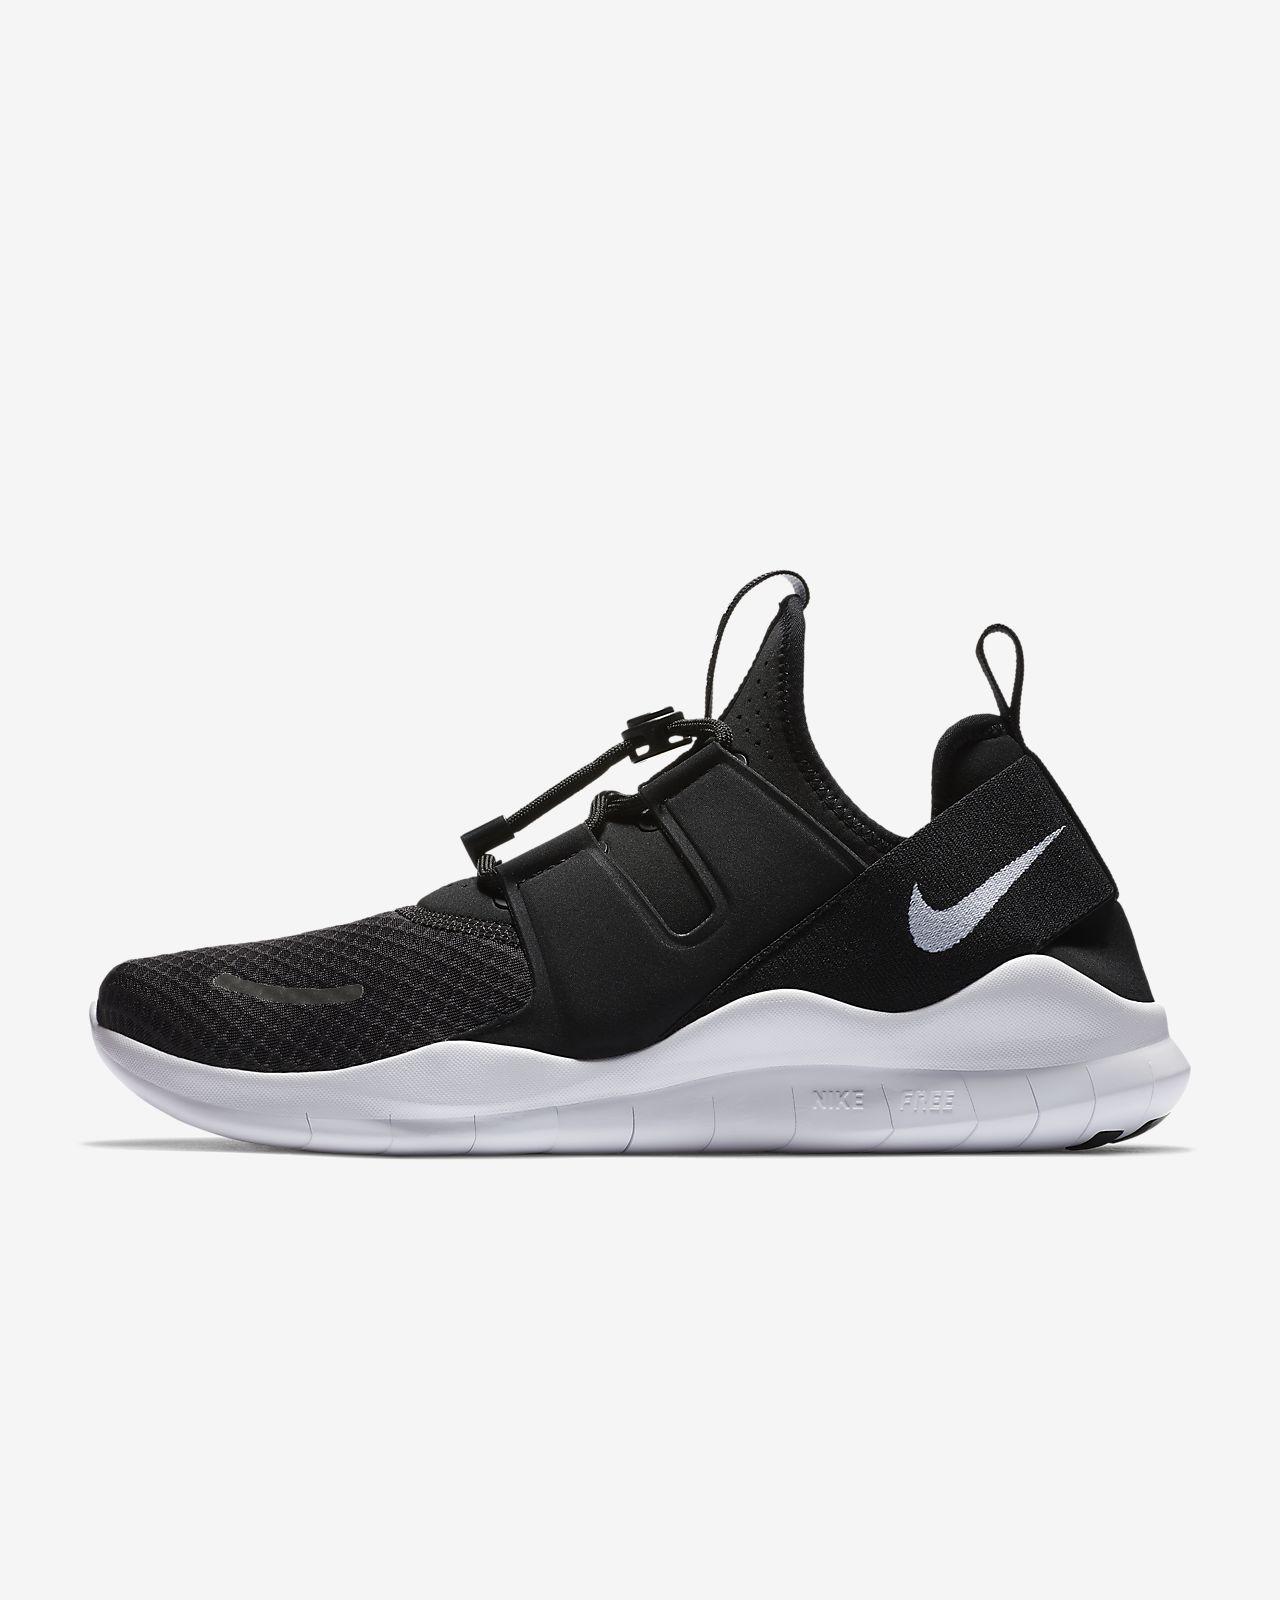 64d3c4ec41f Nike Free RN Commuter 2018 Men s Running Shoe